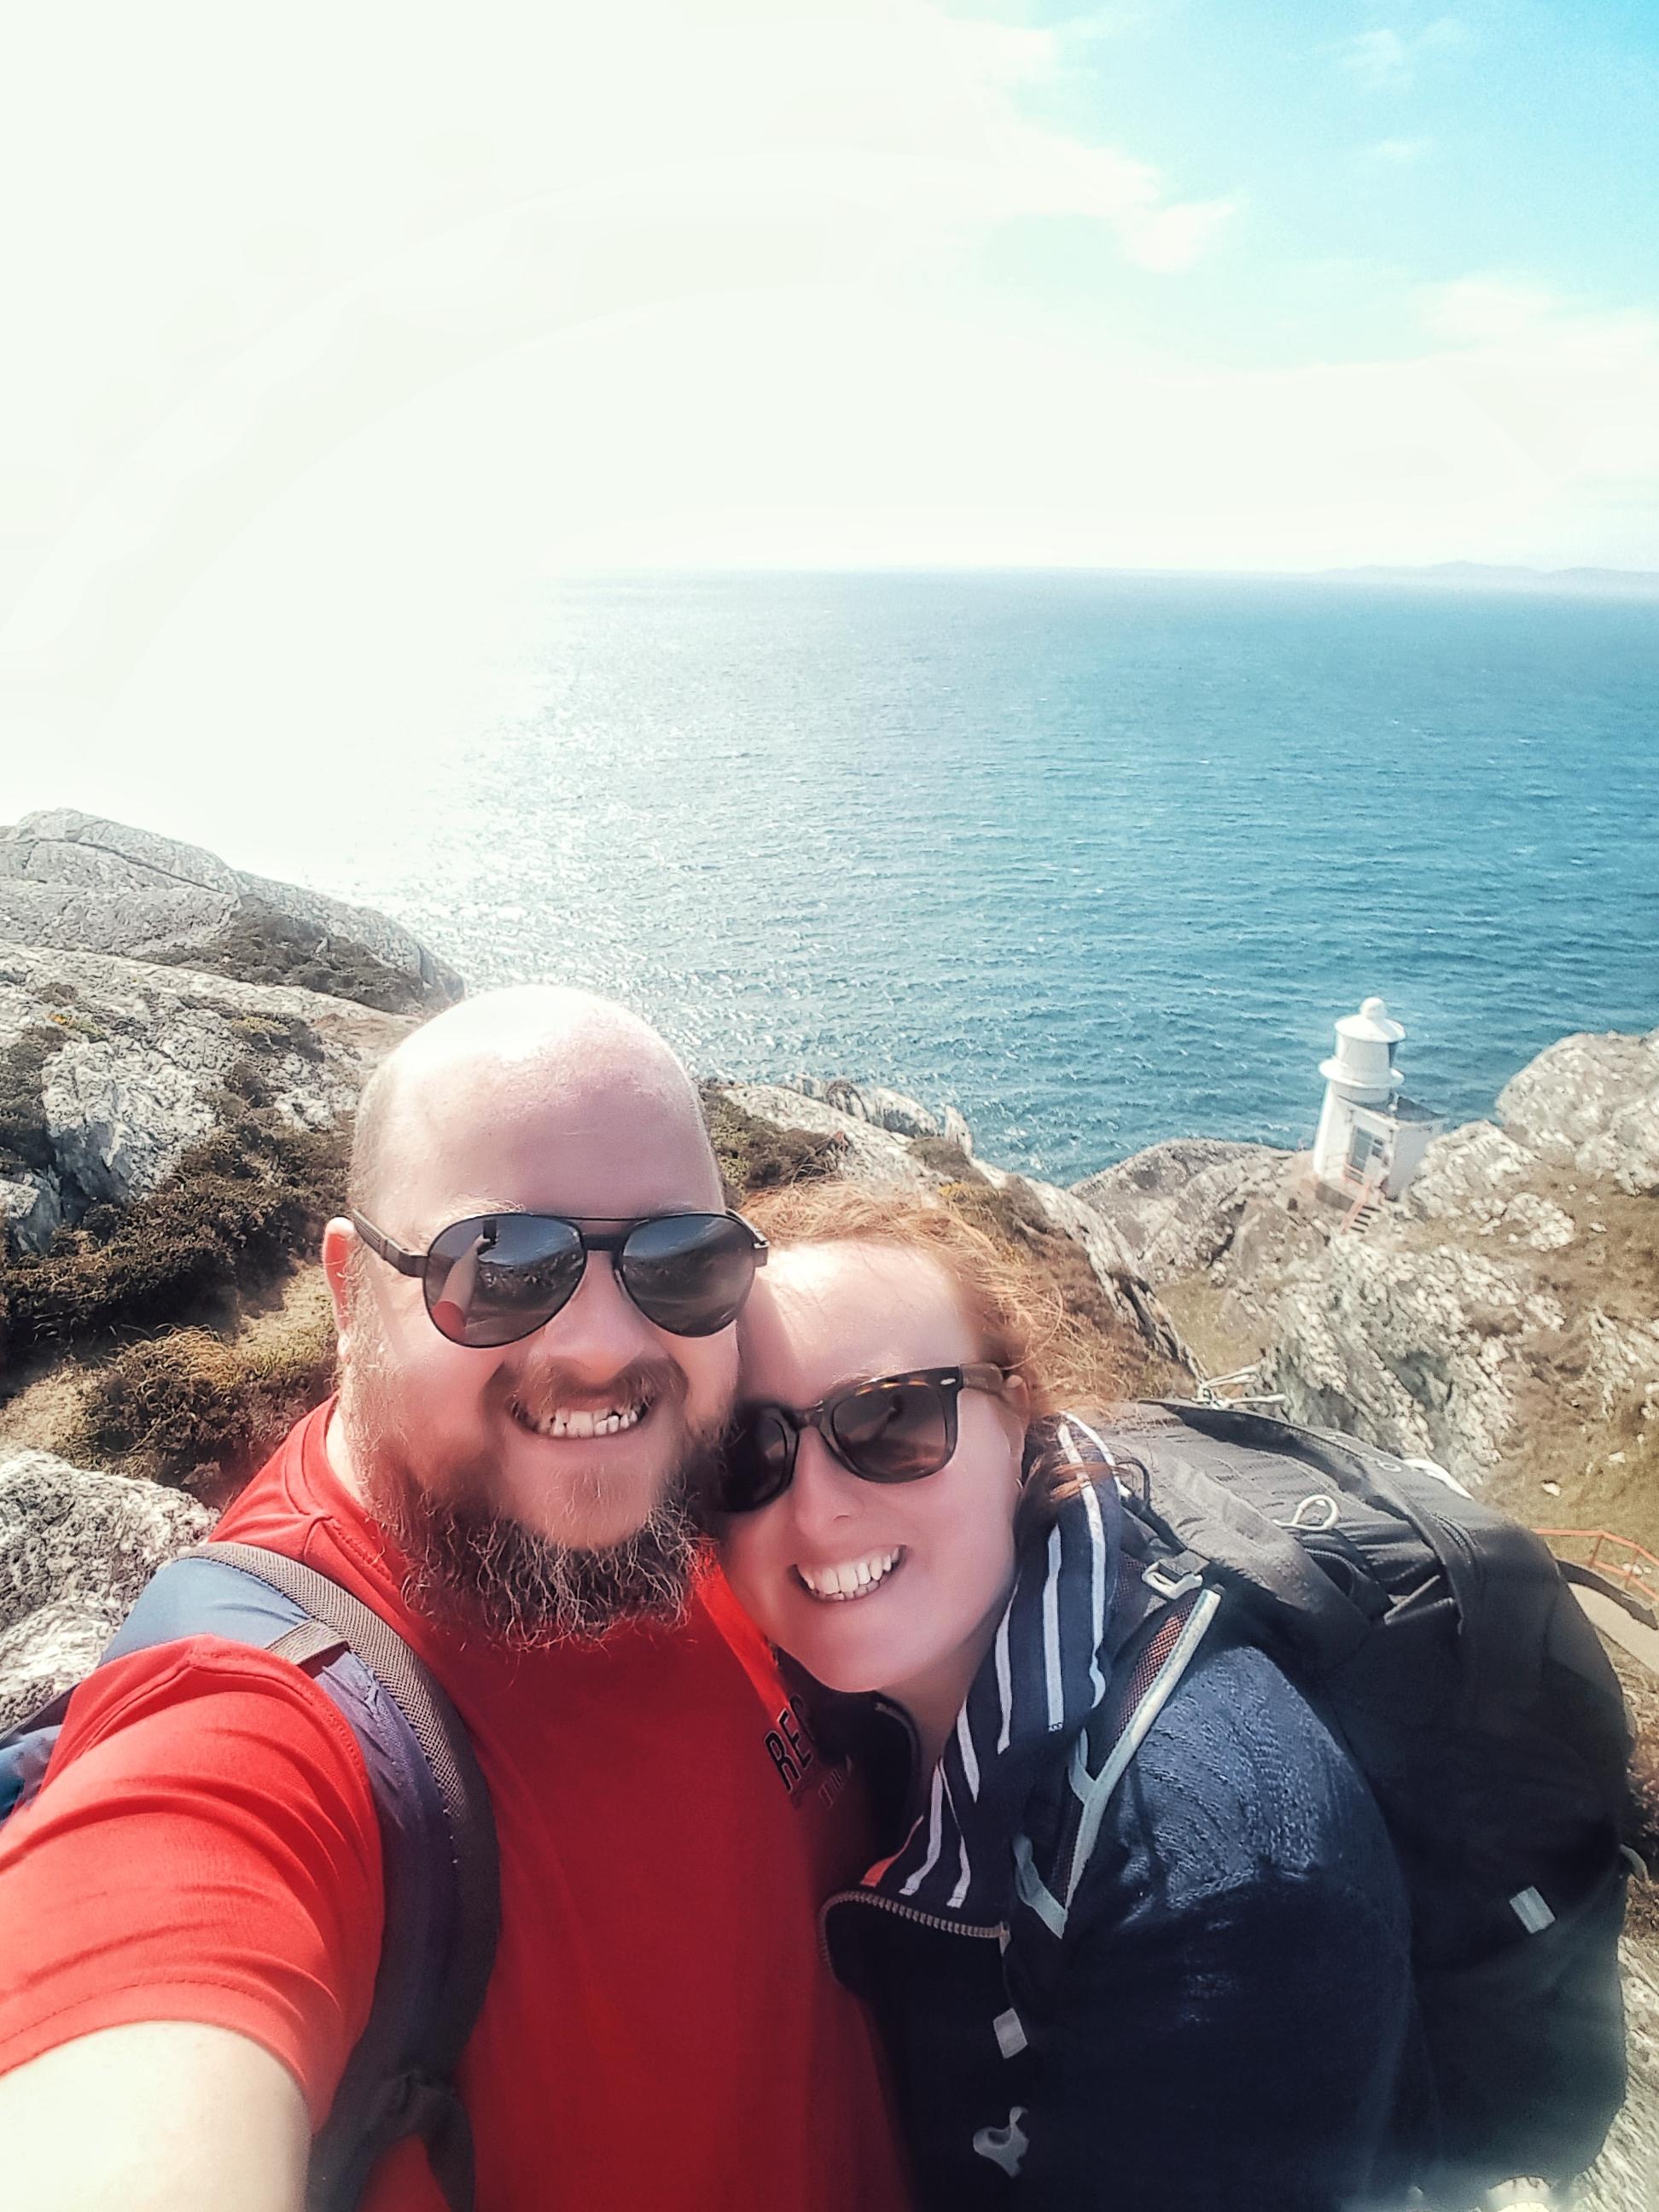 county cork. cork. ireland. irish. history. city. house sitting. old. travel. travel photography. travel photographer.  selfie at the lighthouse. sheeps head lighthouse.jpg